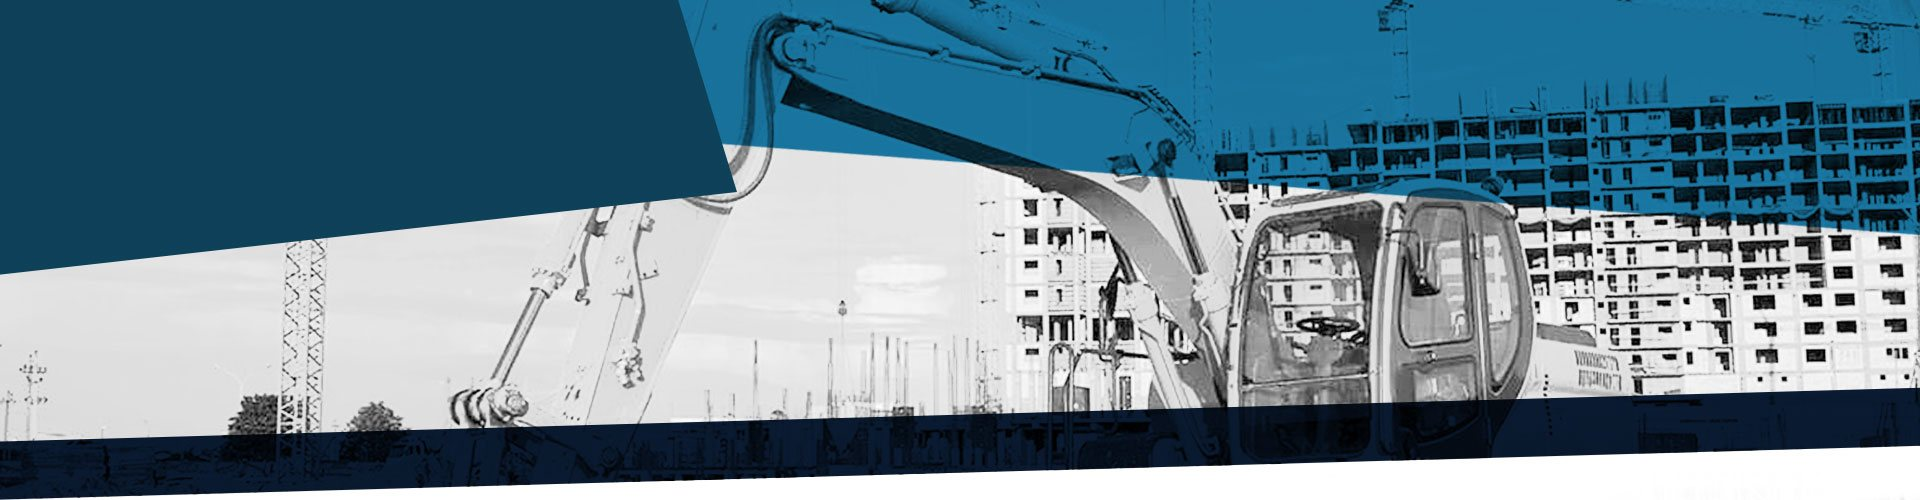 Phoenix Grup Bacau - constructii civile si industriale, statie de betoane